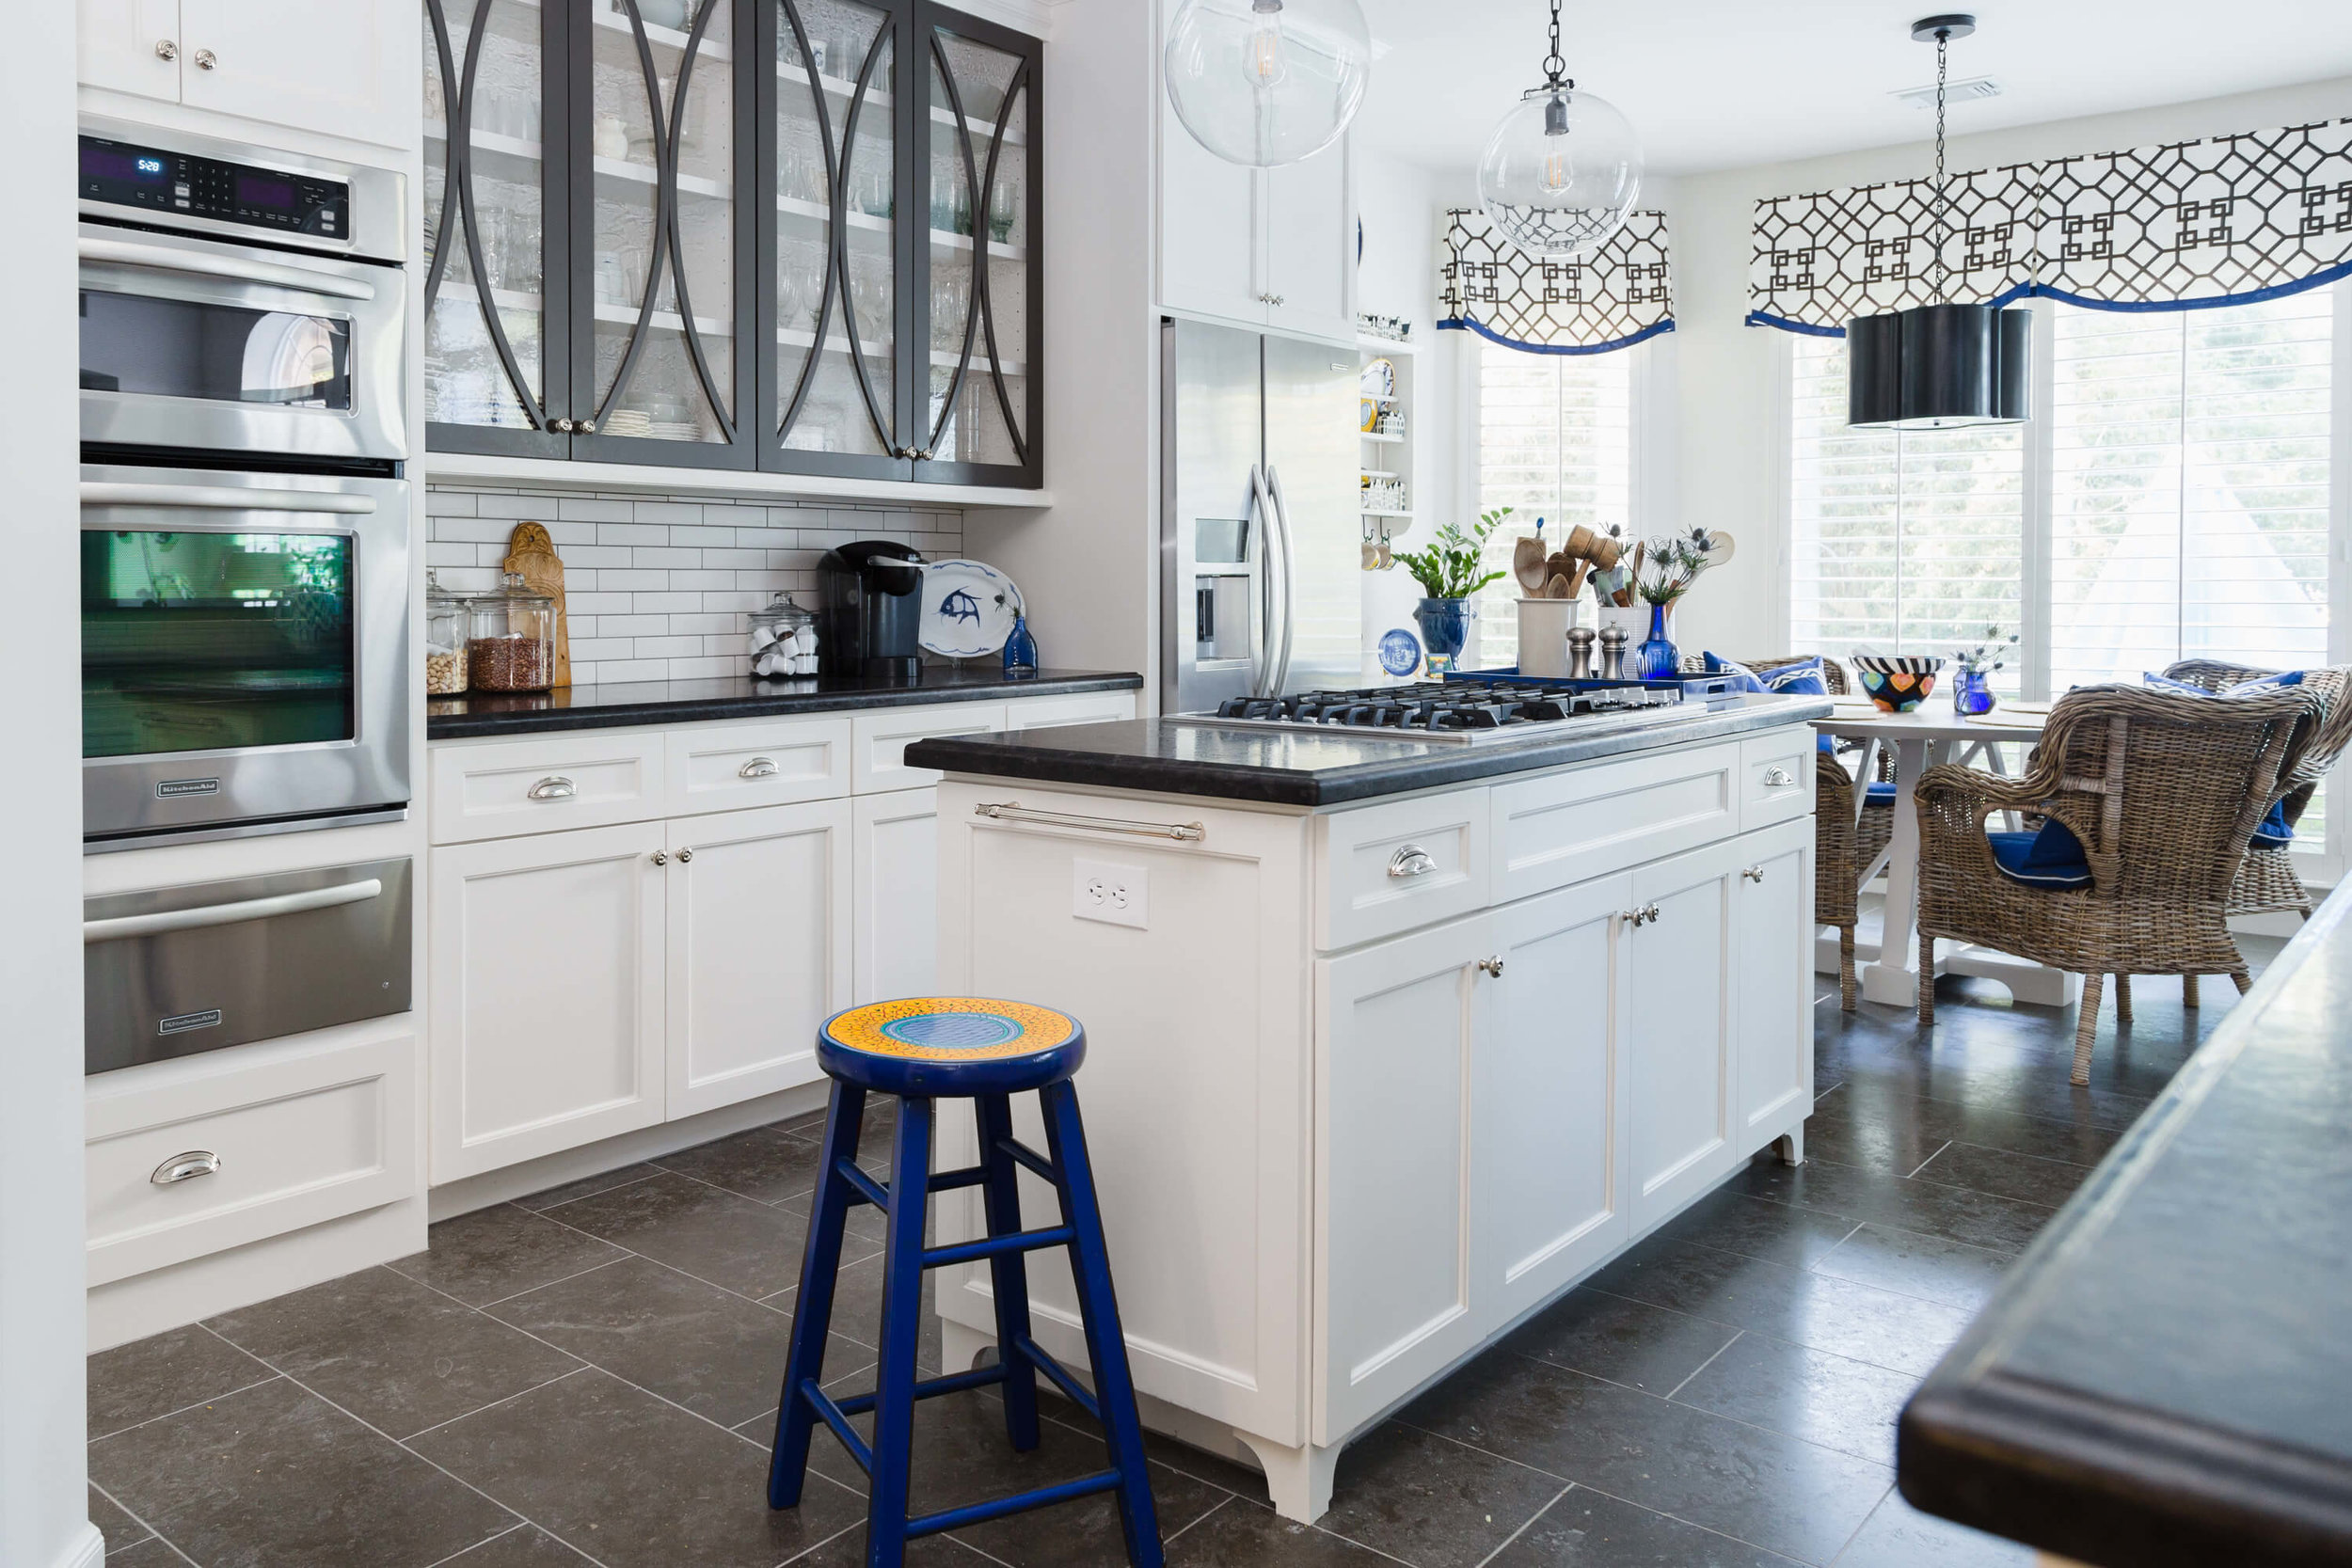 Kitchen Styling - Carla Aston, Photographer: Tori Aston #kitchenstyling